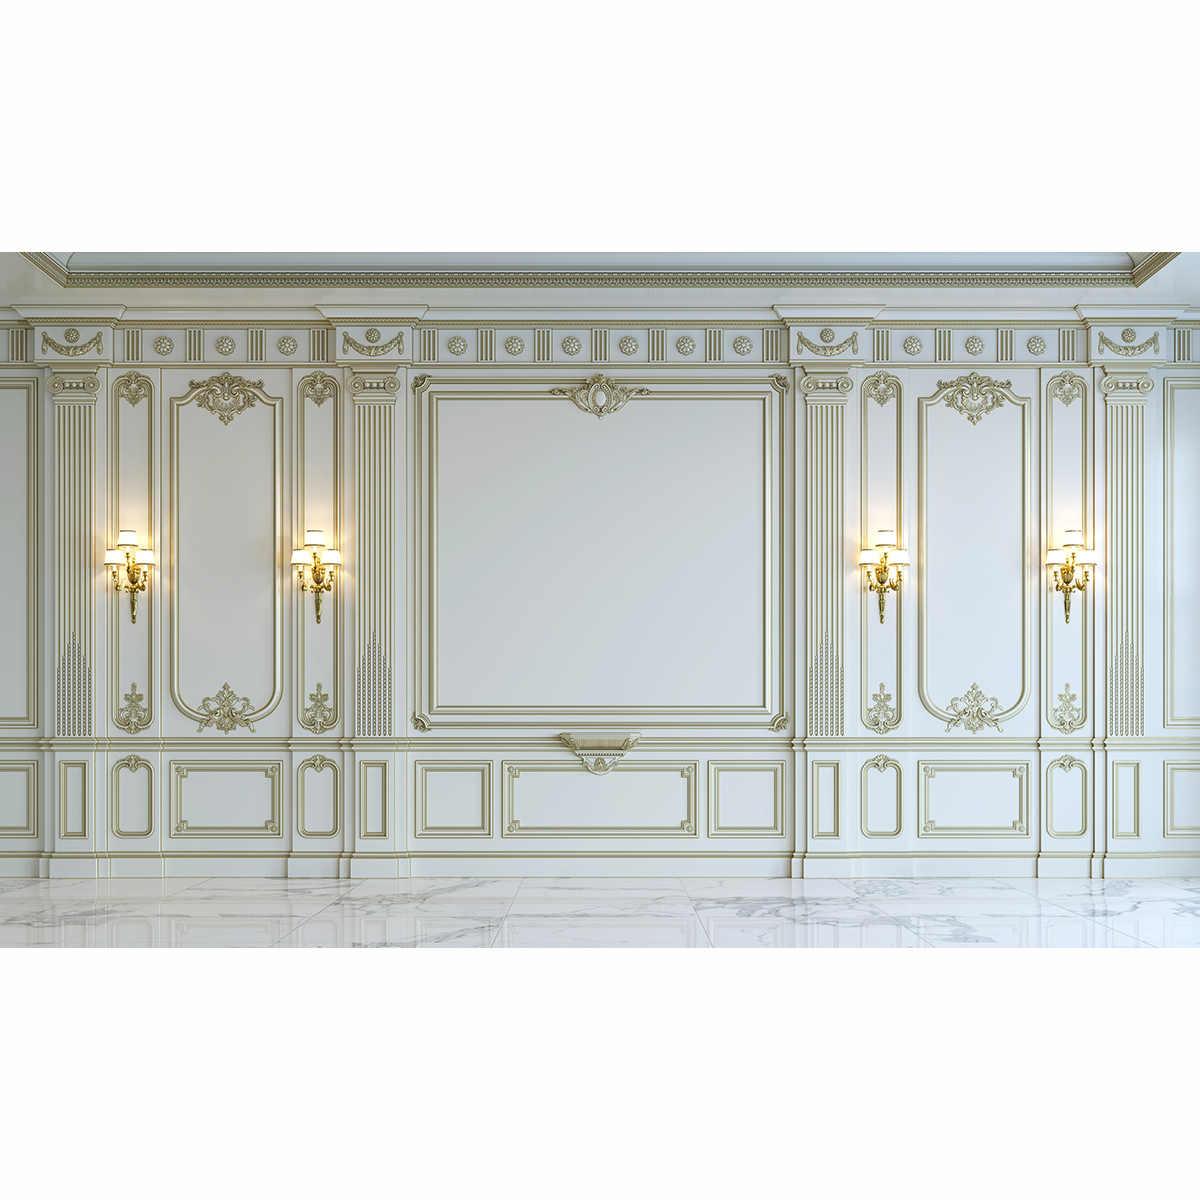 Fondo Allenjoy para estudio fotográfico Palacio de lujo mármol retro europeo telón de fondo fotografía photocall